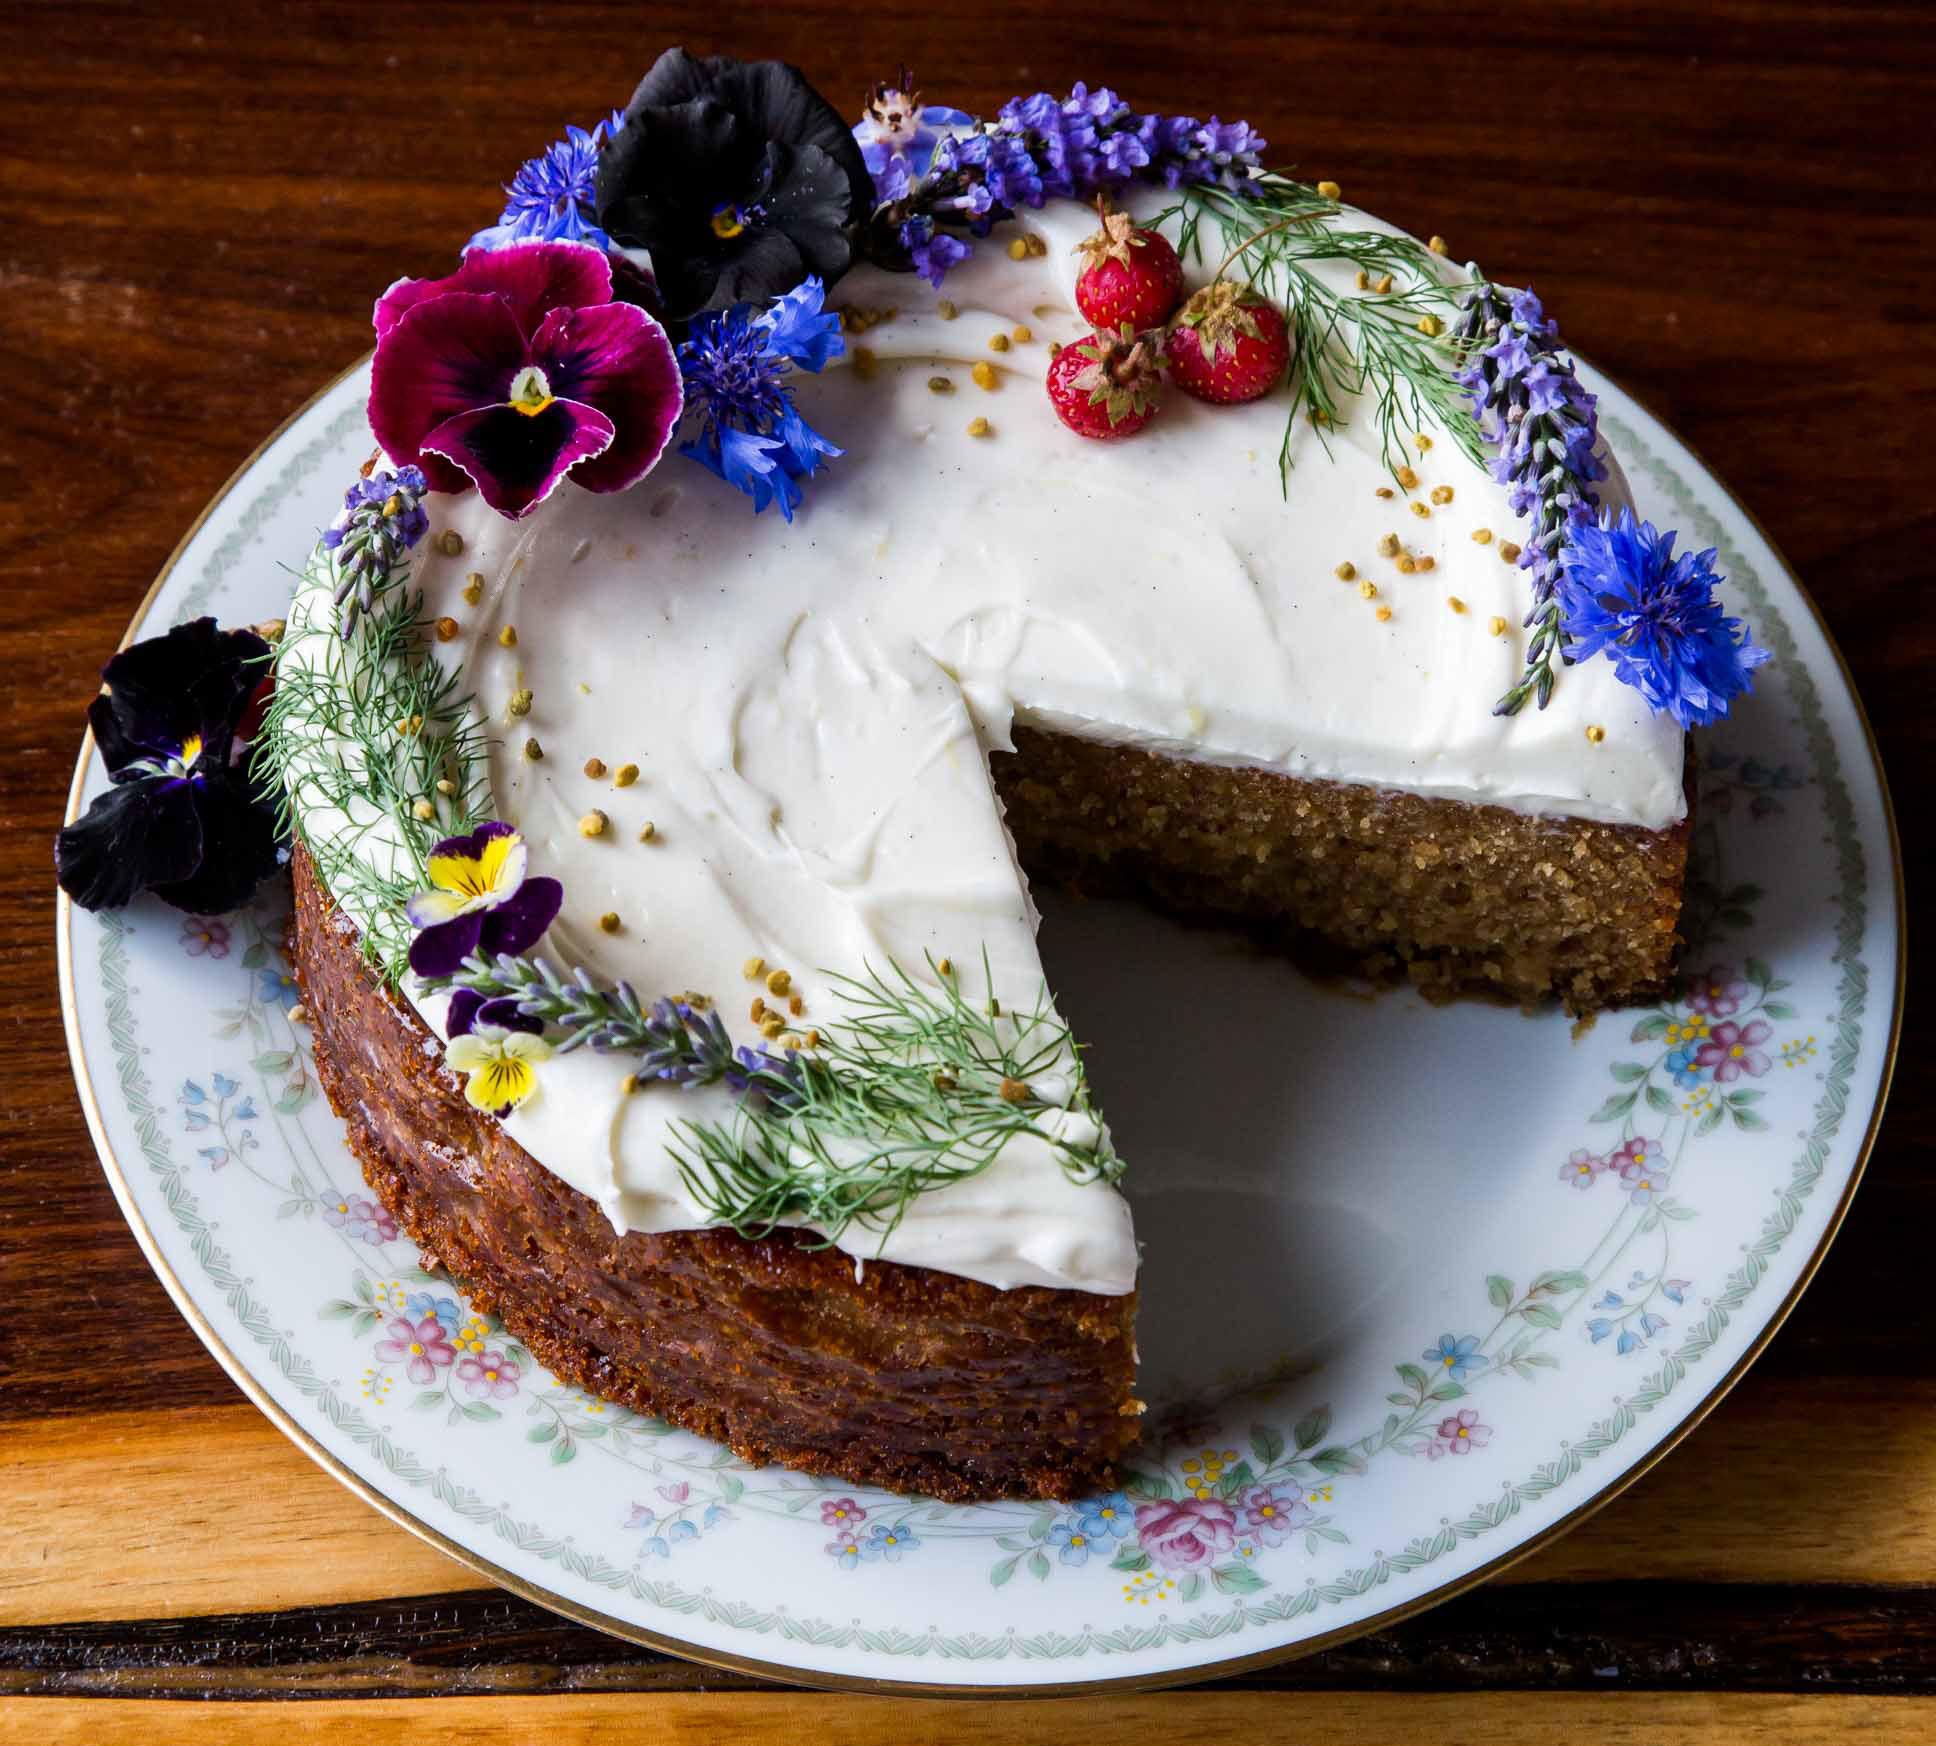 Milktooth's Honey Whey Cake – one of Bon Appetit Magazines Top 10 Desserts of 2015 / Photo by Peter Frank Edwards via bonappetit.com